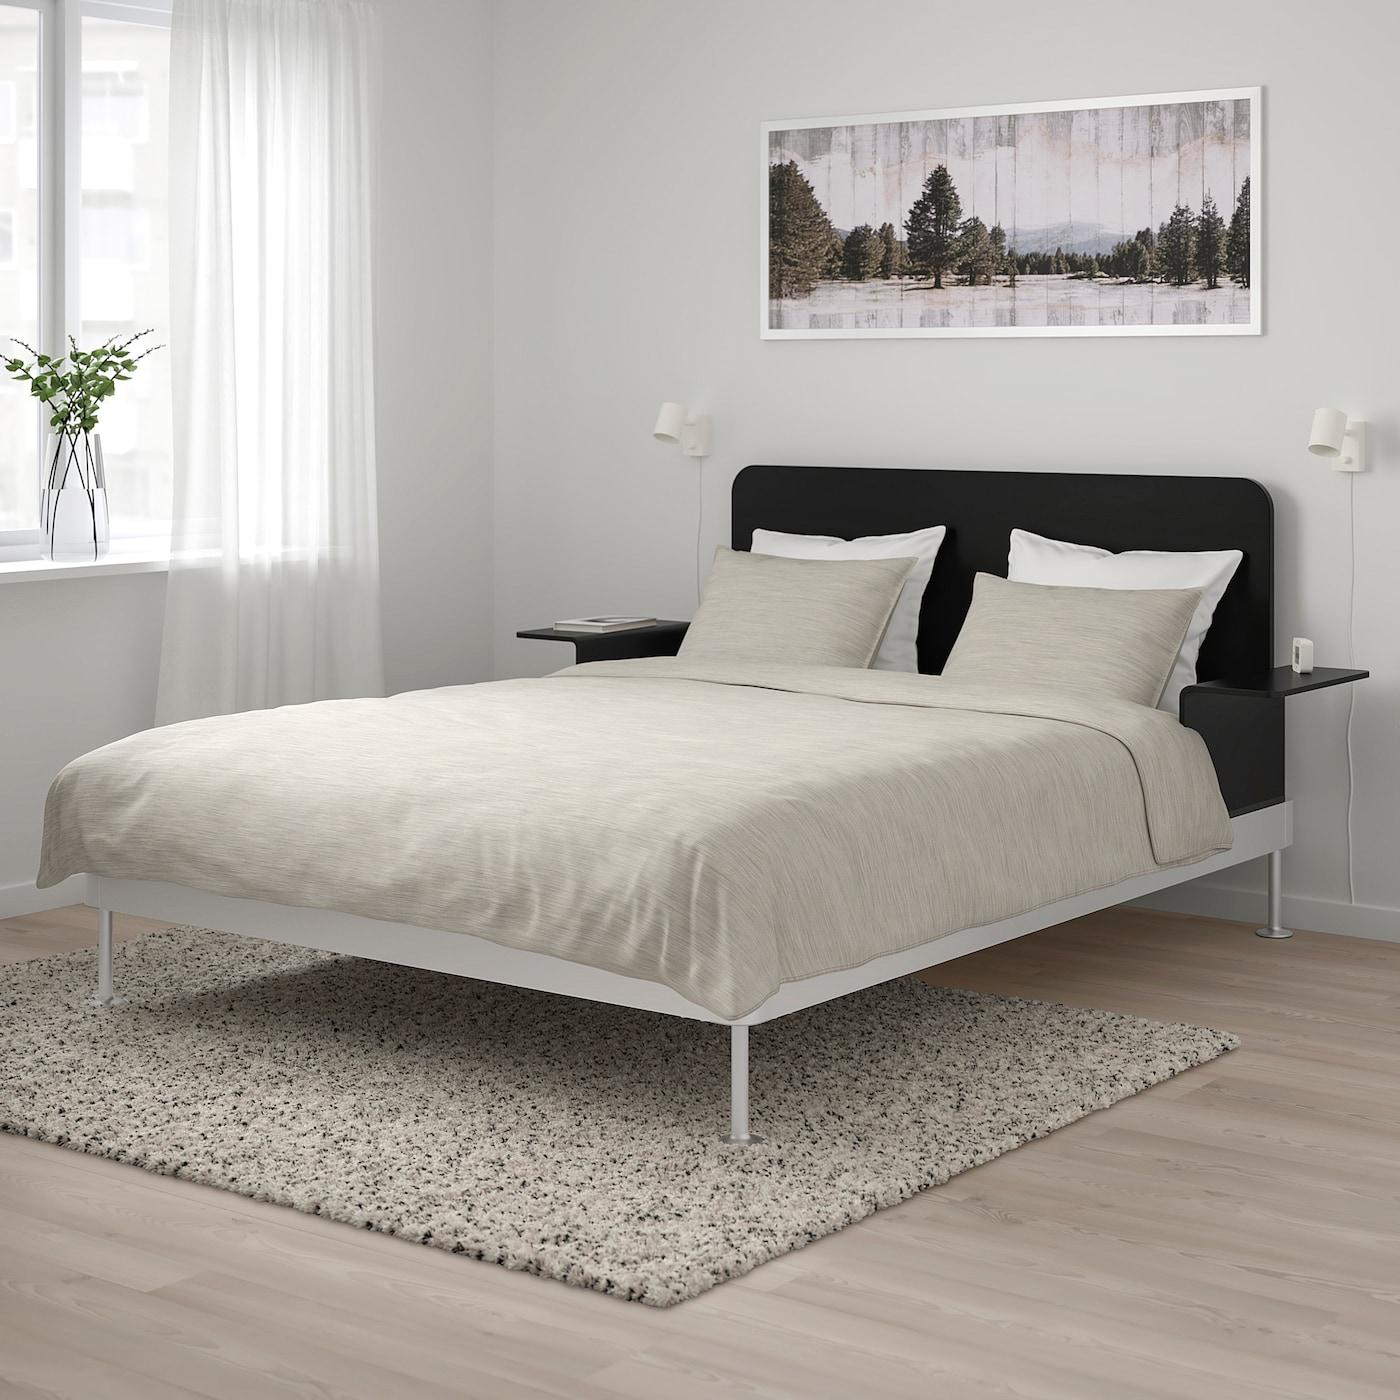 Delaktig Bed Frame Headboard 2 Side Tables Aluminium Black Ikea